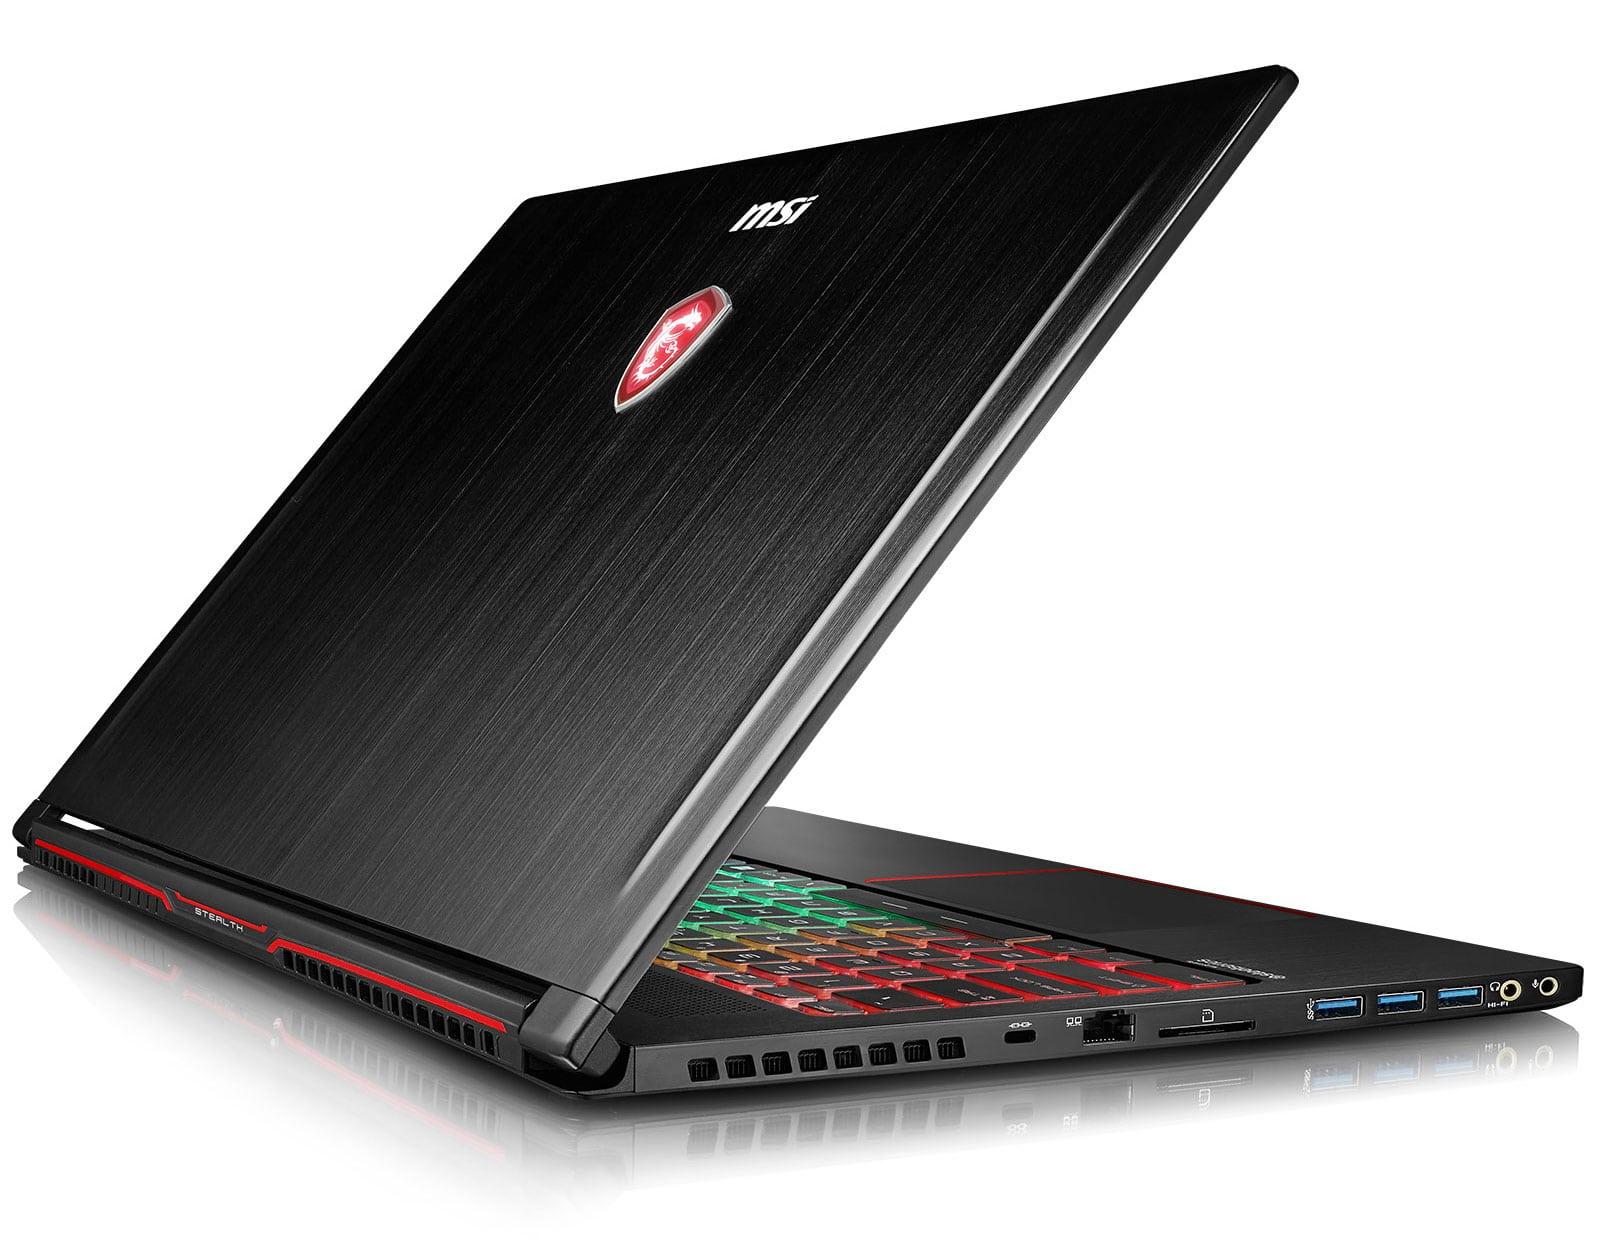 "MSI GS63VR 7RG-092, Ultrabook gamer 15"" fin 120Hz GTX 1070 i7 SSD à 1759€"